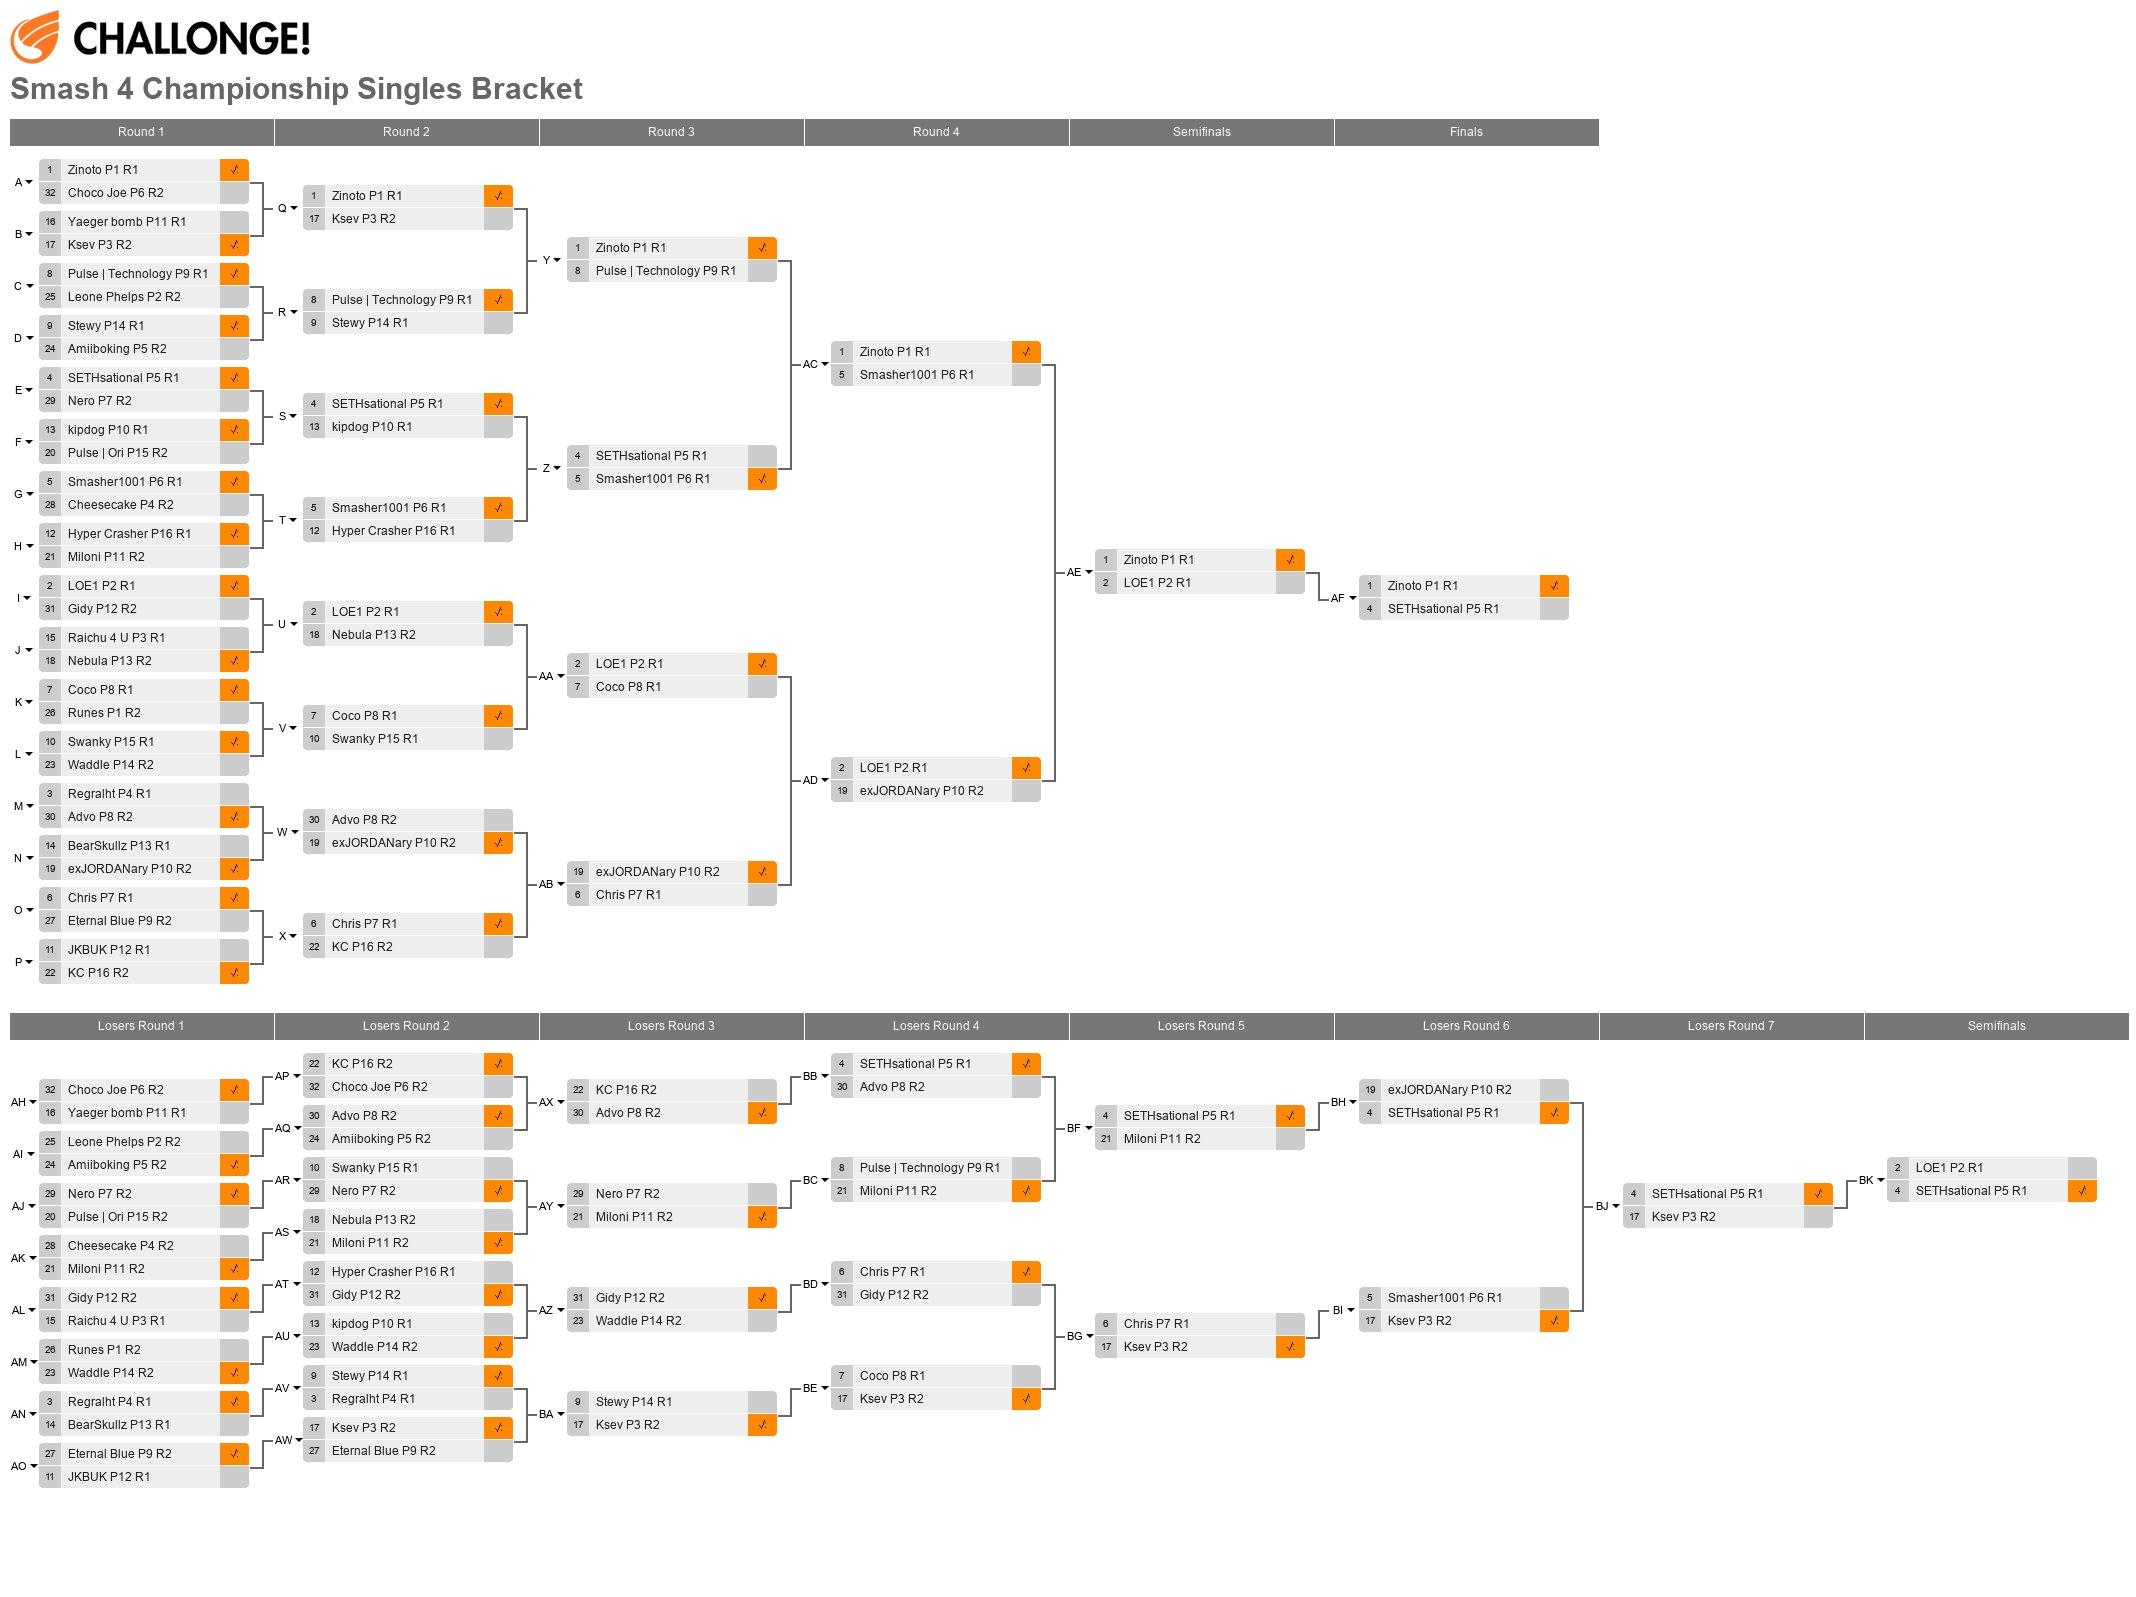 Smash 4 Championship Singles Bracket